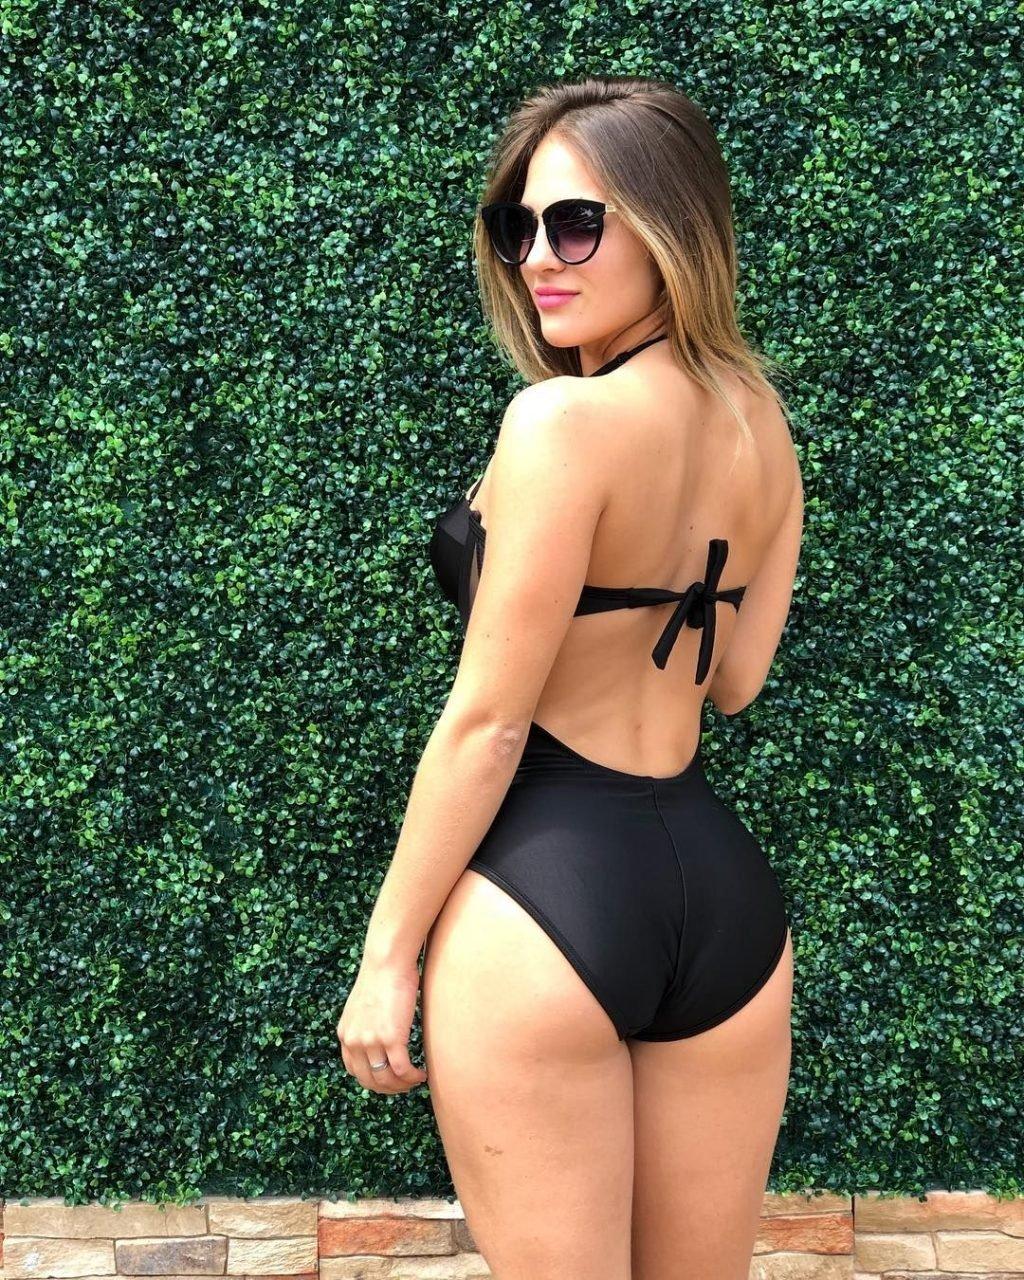 Porno Daysy Rodriguez Ferreira nude photos 2019